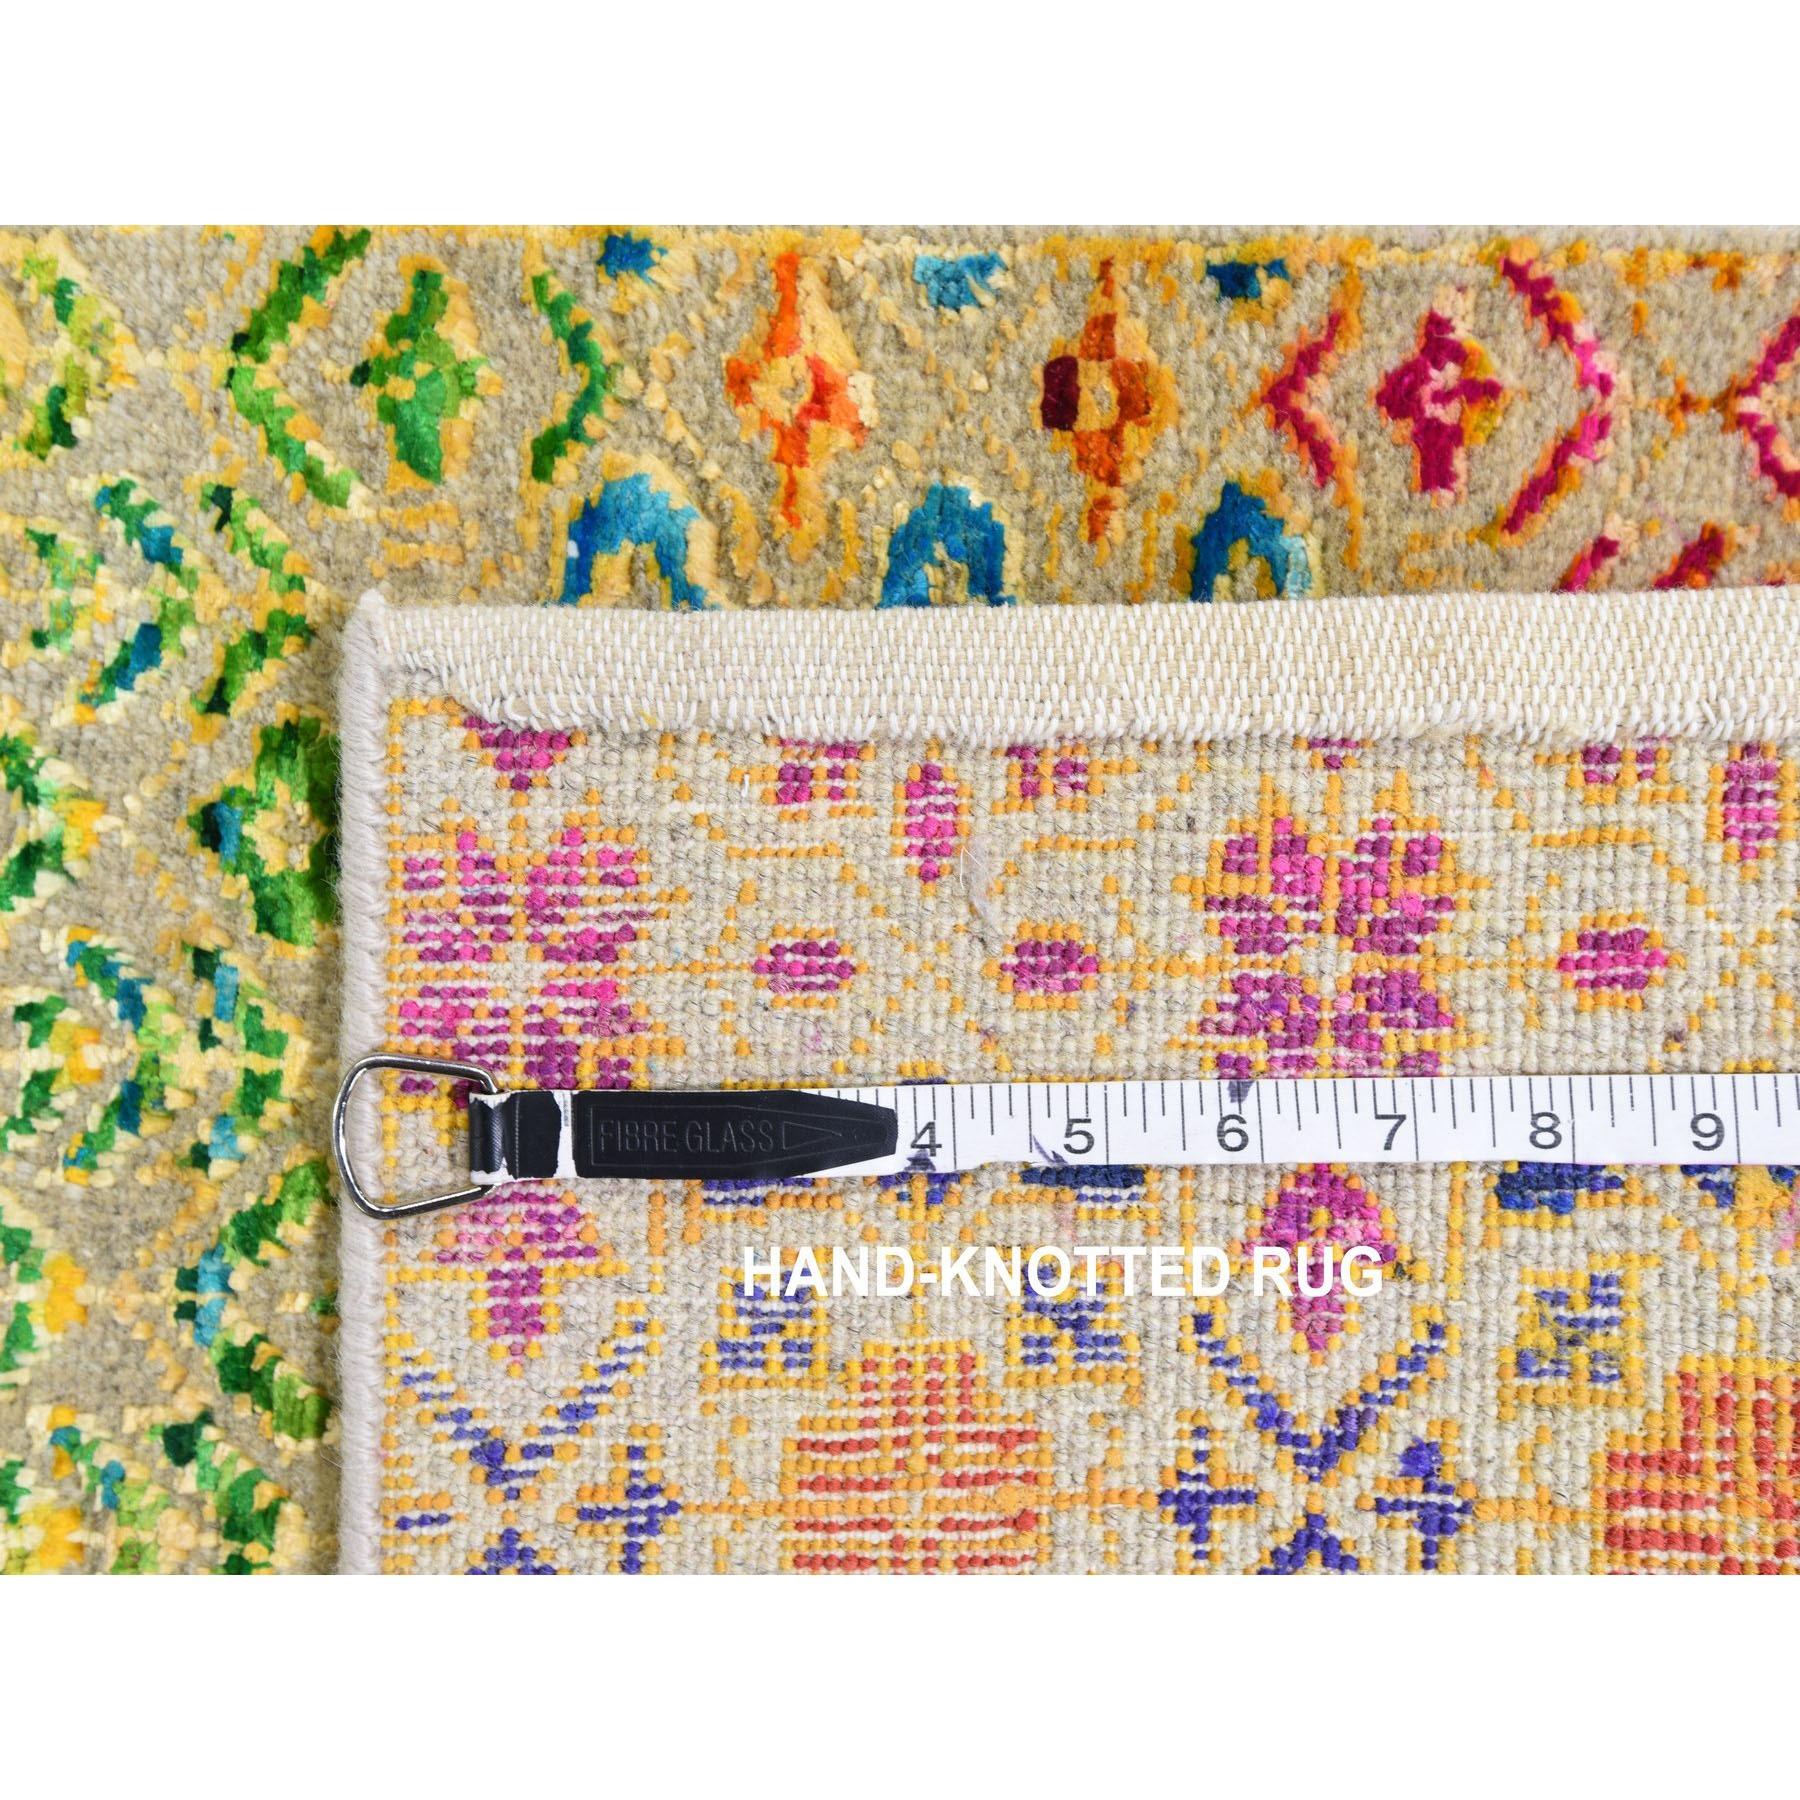 2-x3- Colorful Grass Design Sari Silk Textured Wool Modern Hand Knotted Oriental Rug